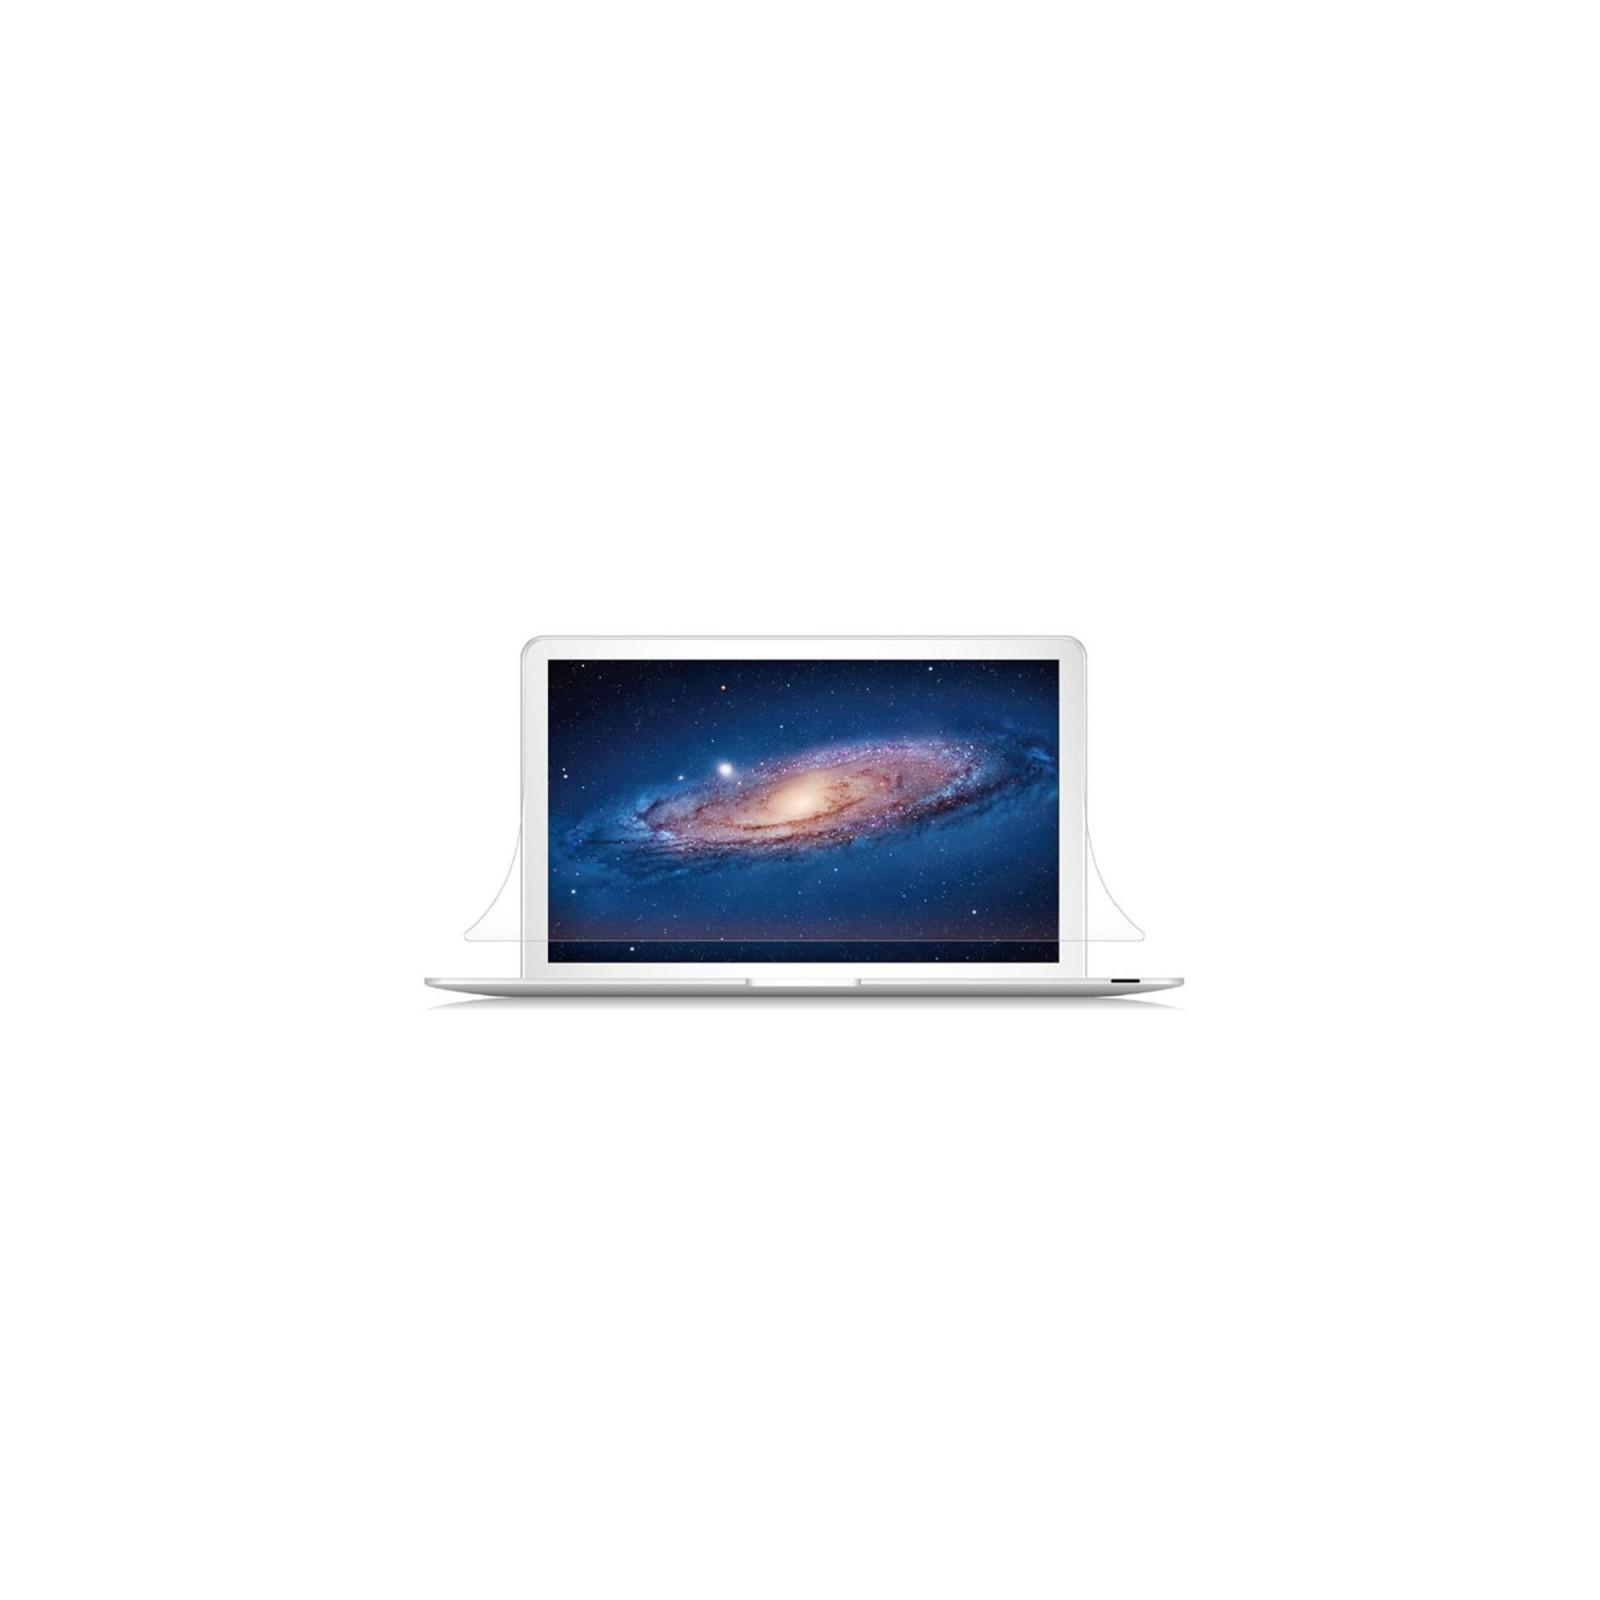 Пленка защитная JCPAL iWoda для MacBook Air 11 (High Transparency) (JCP2009) изображение 3